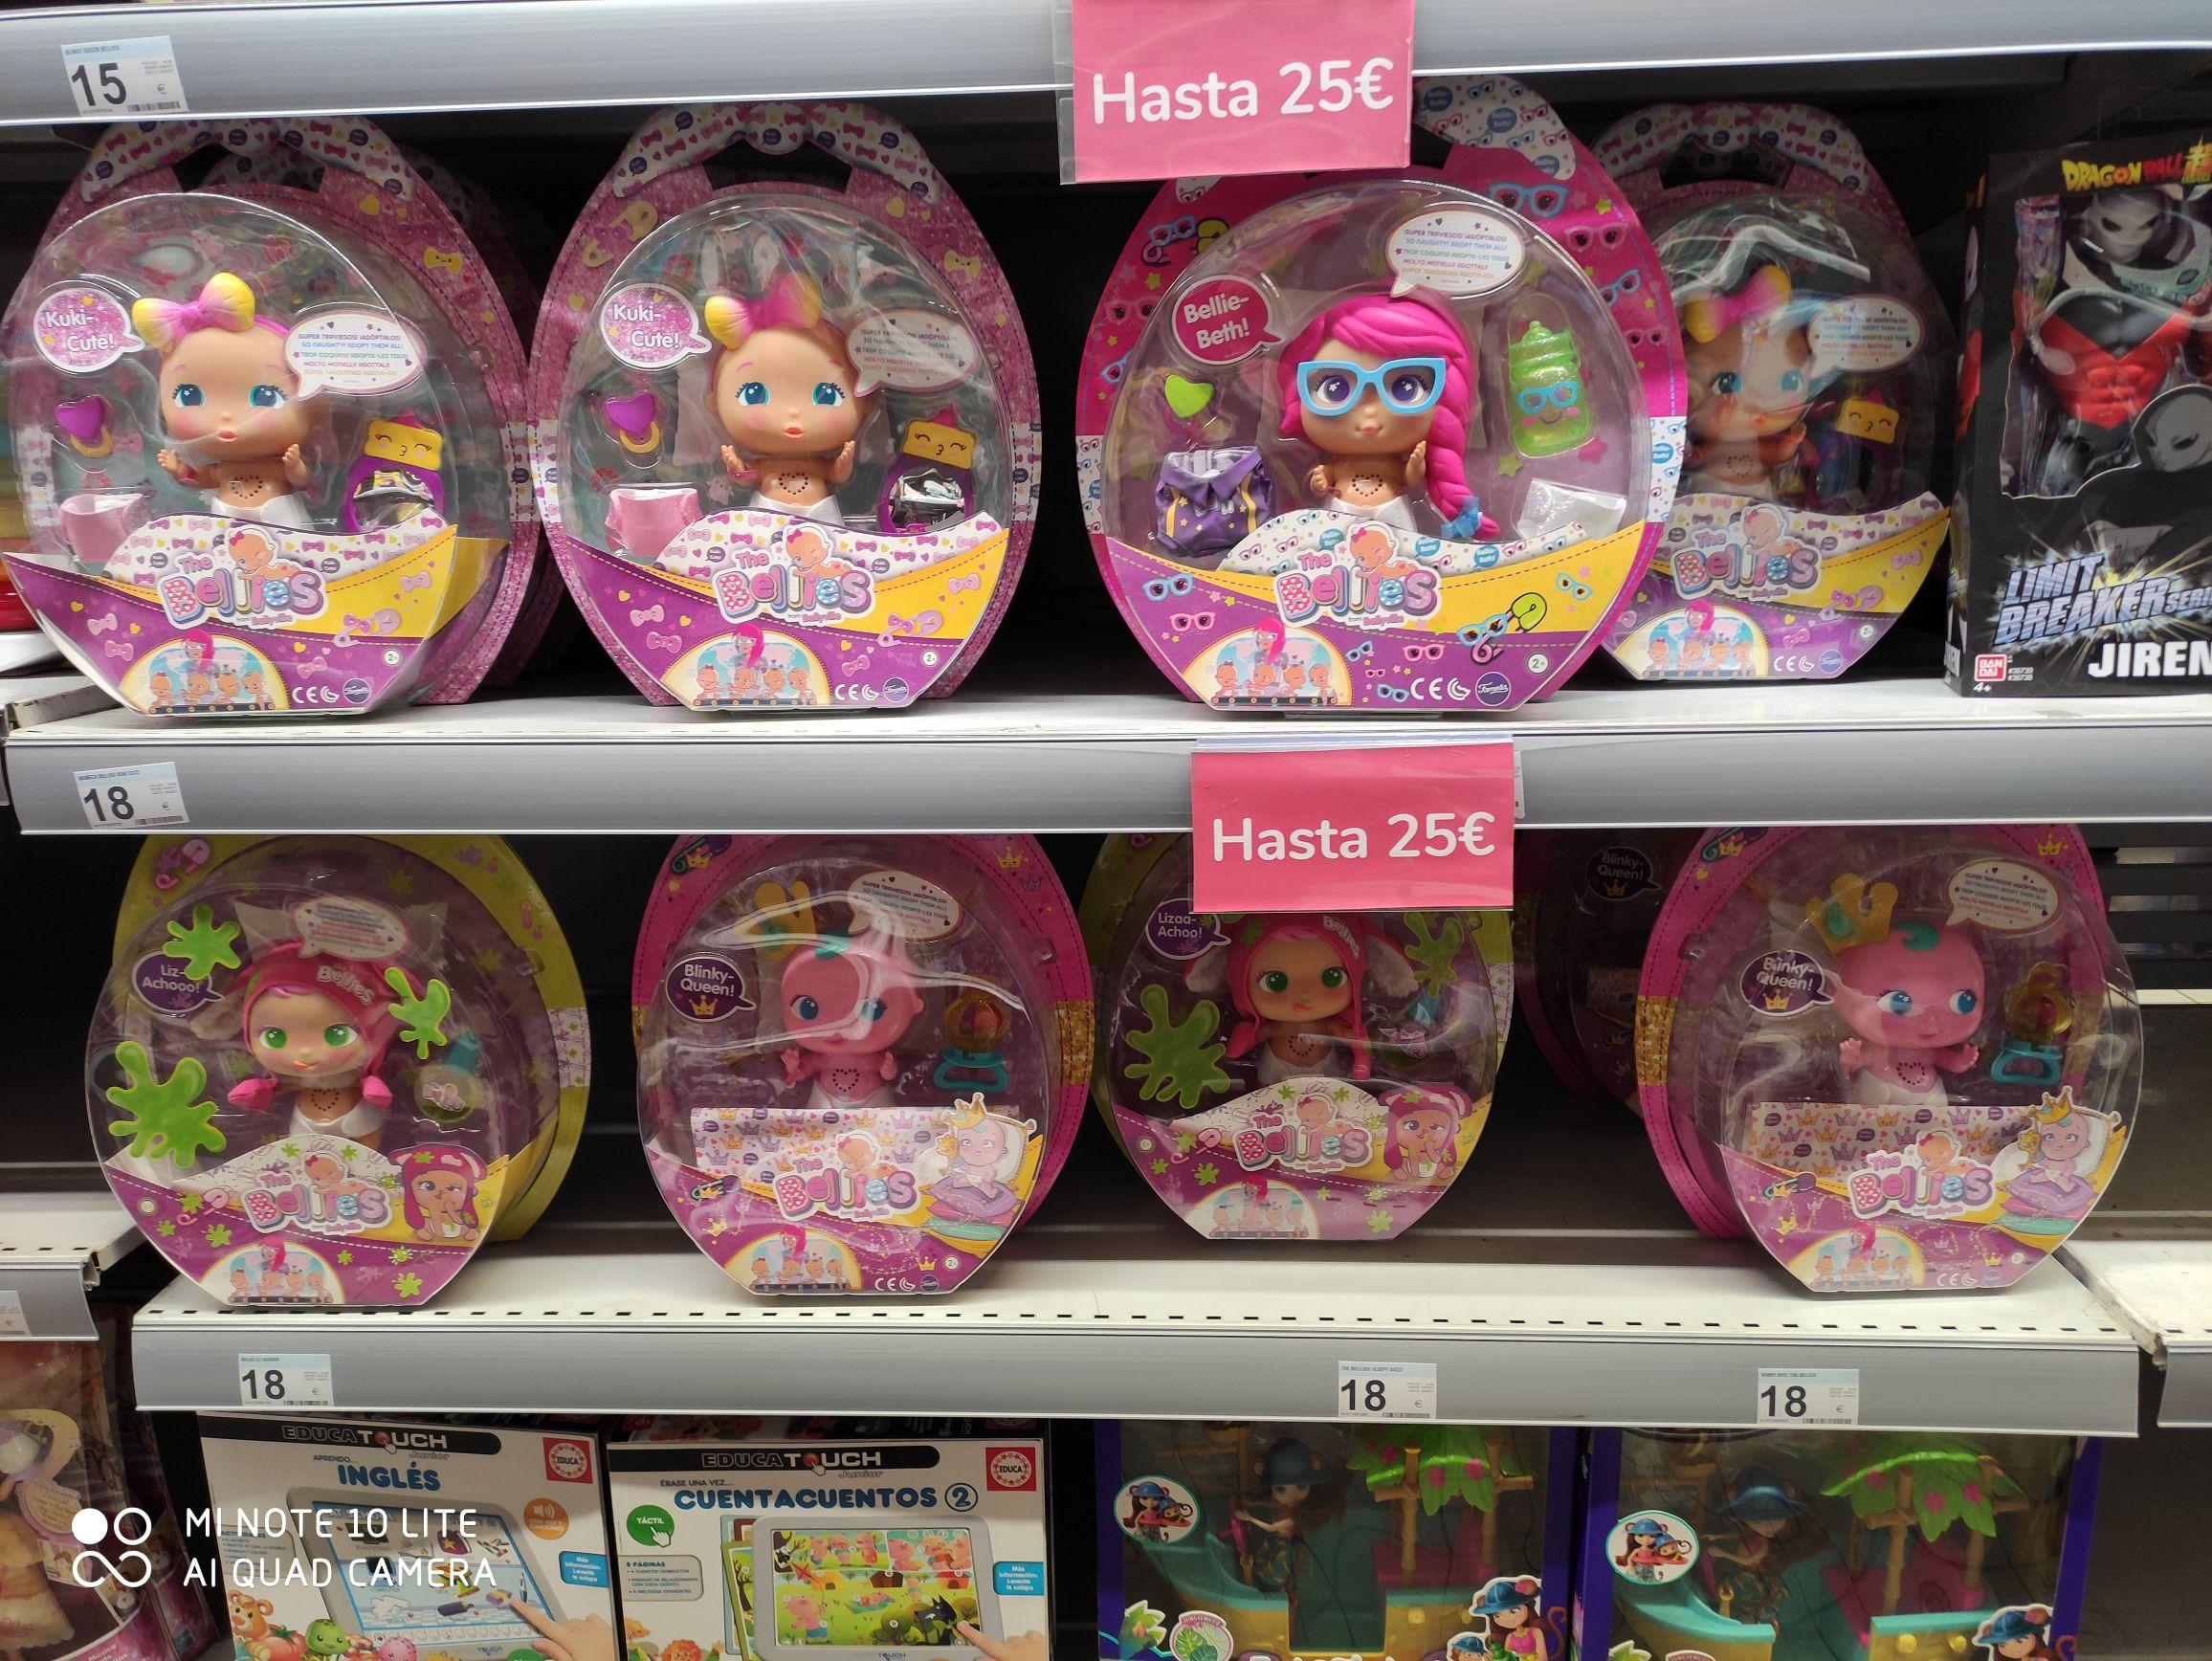 Bellies muñecas en oferta en Carrefour (Carrefour de Getafe Bulevares)